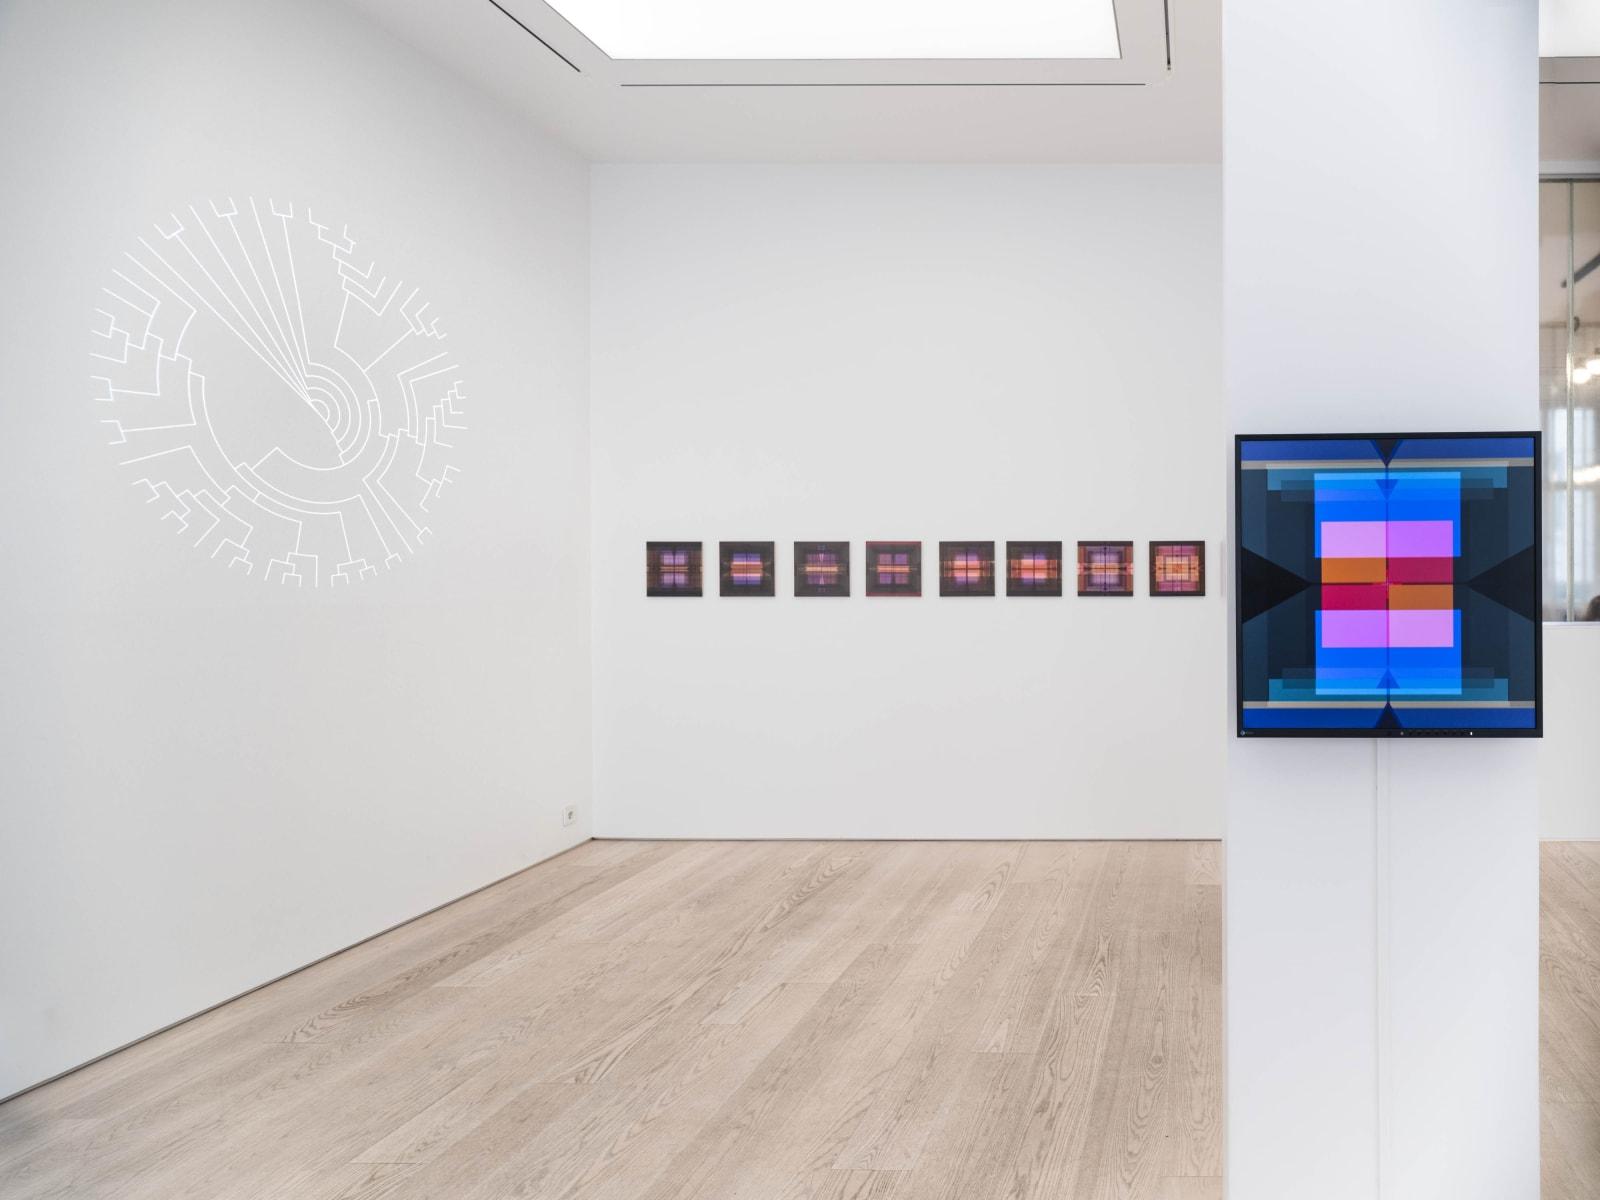 Katarina Löfström Installation view Point Blank at Andréhn-Schiptjenko, Stockholm, 2021